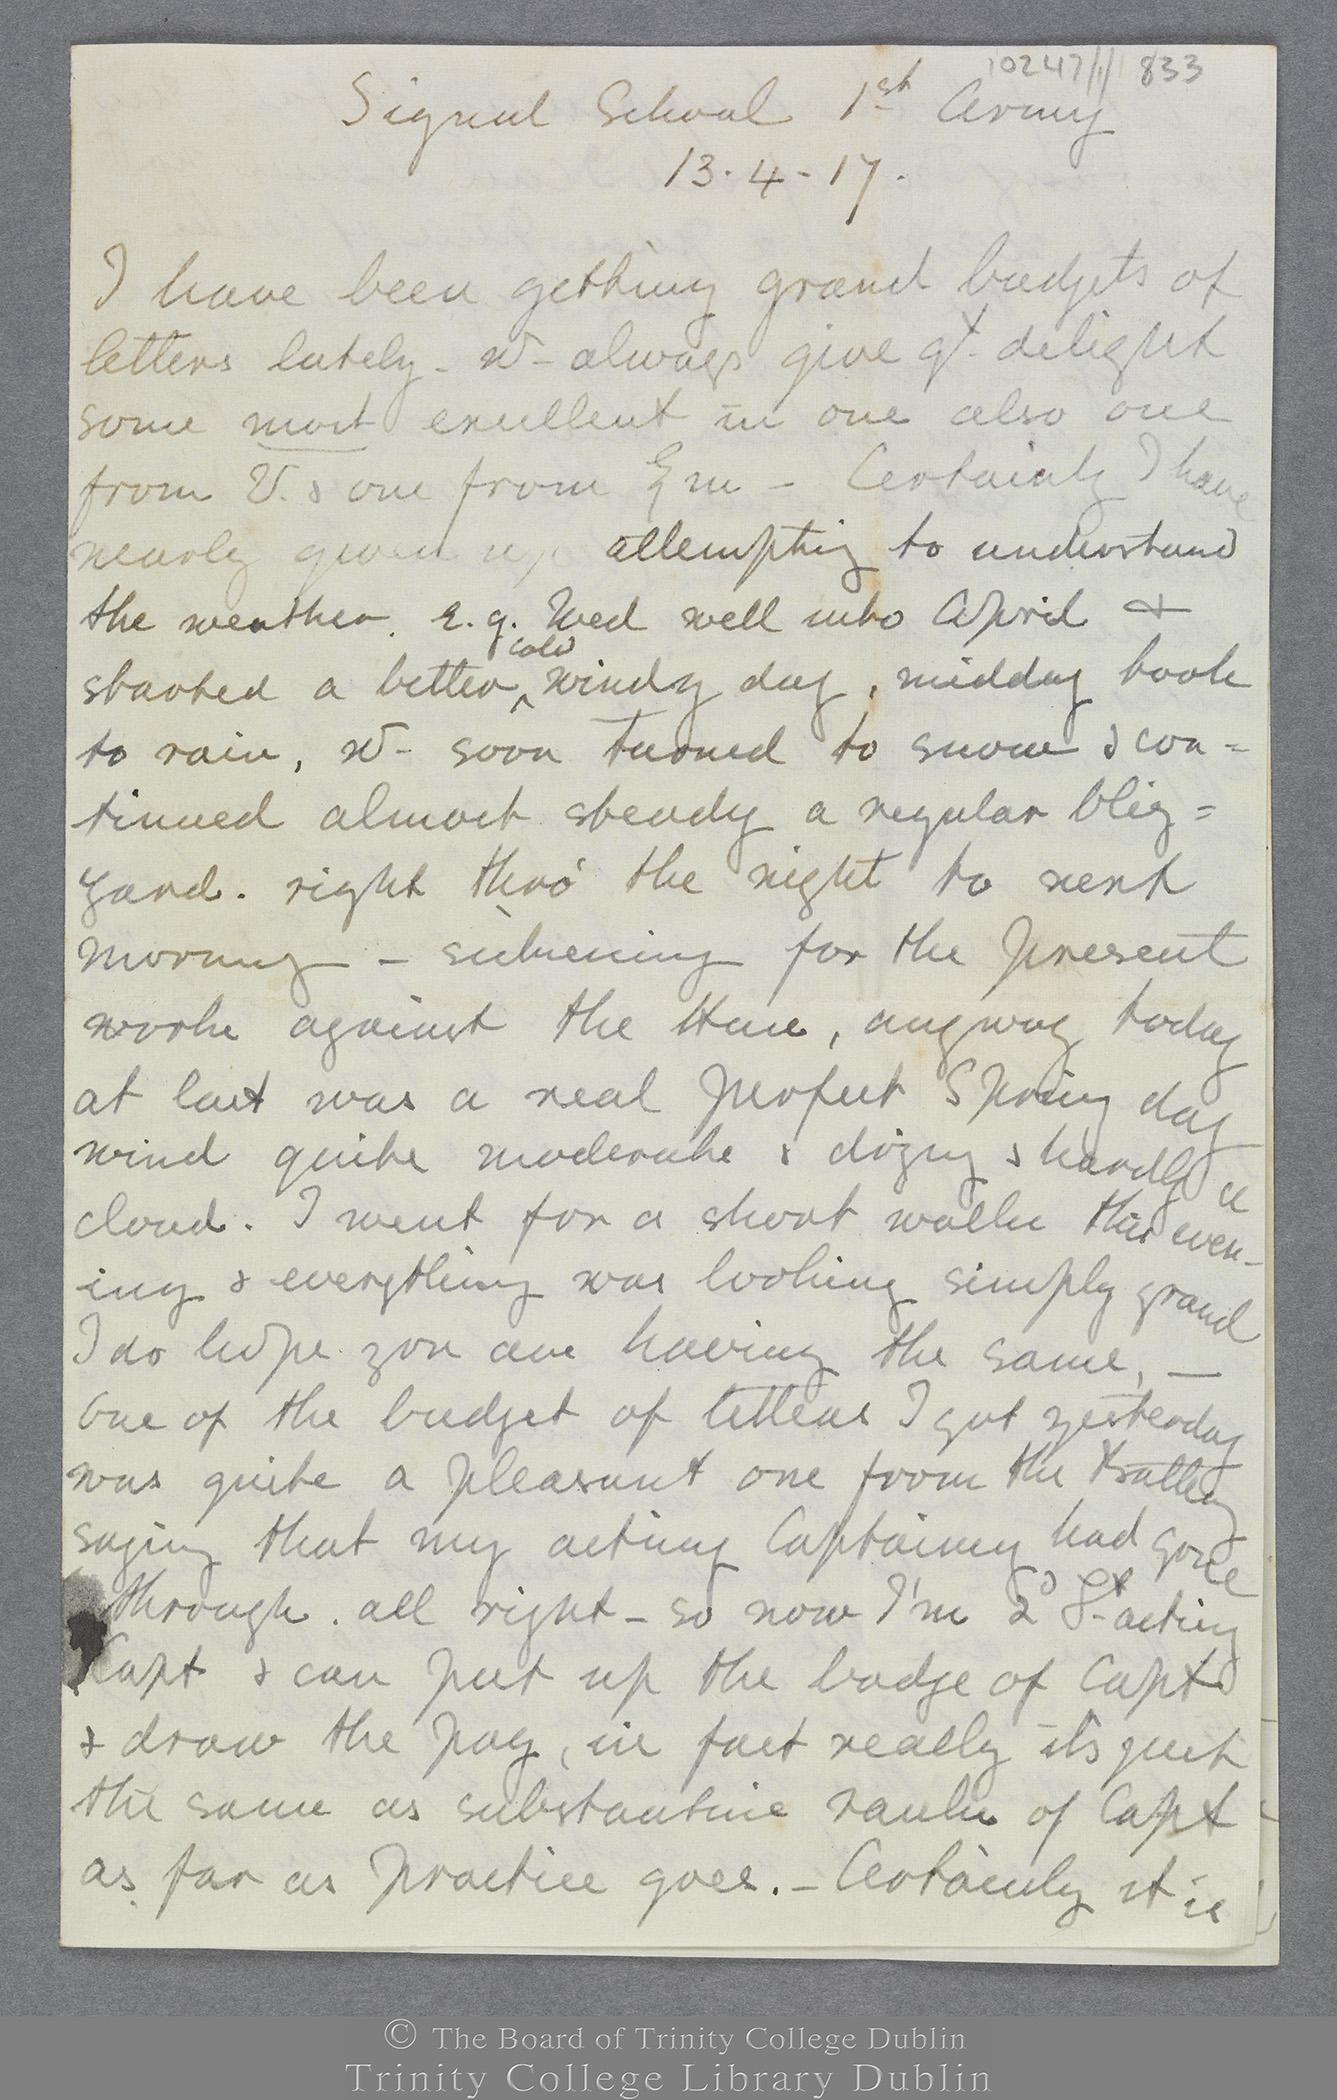 TCD MS 10247/1/833 folio 1 recto